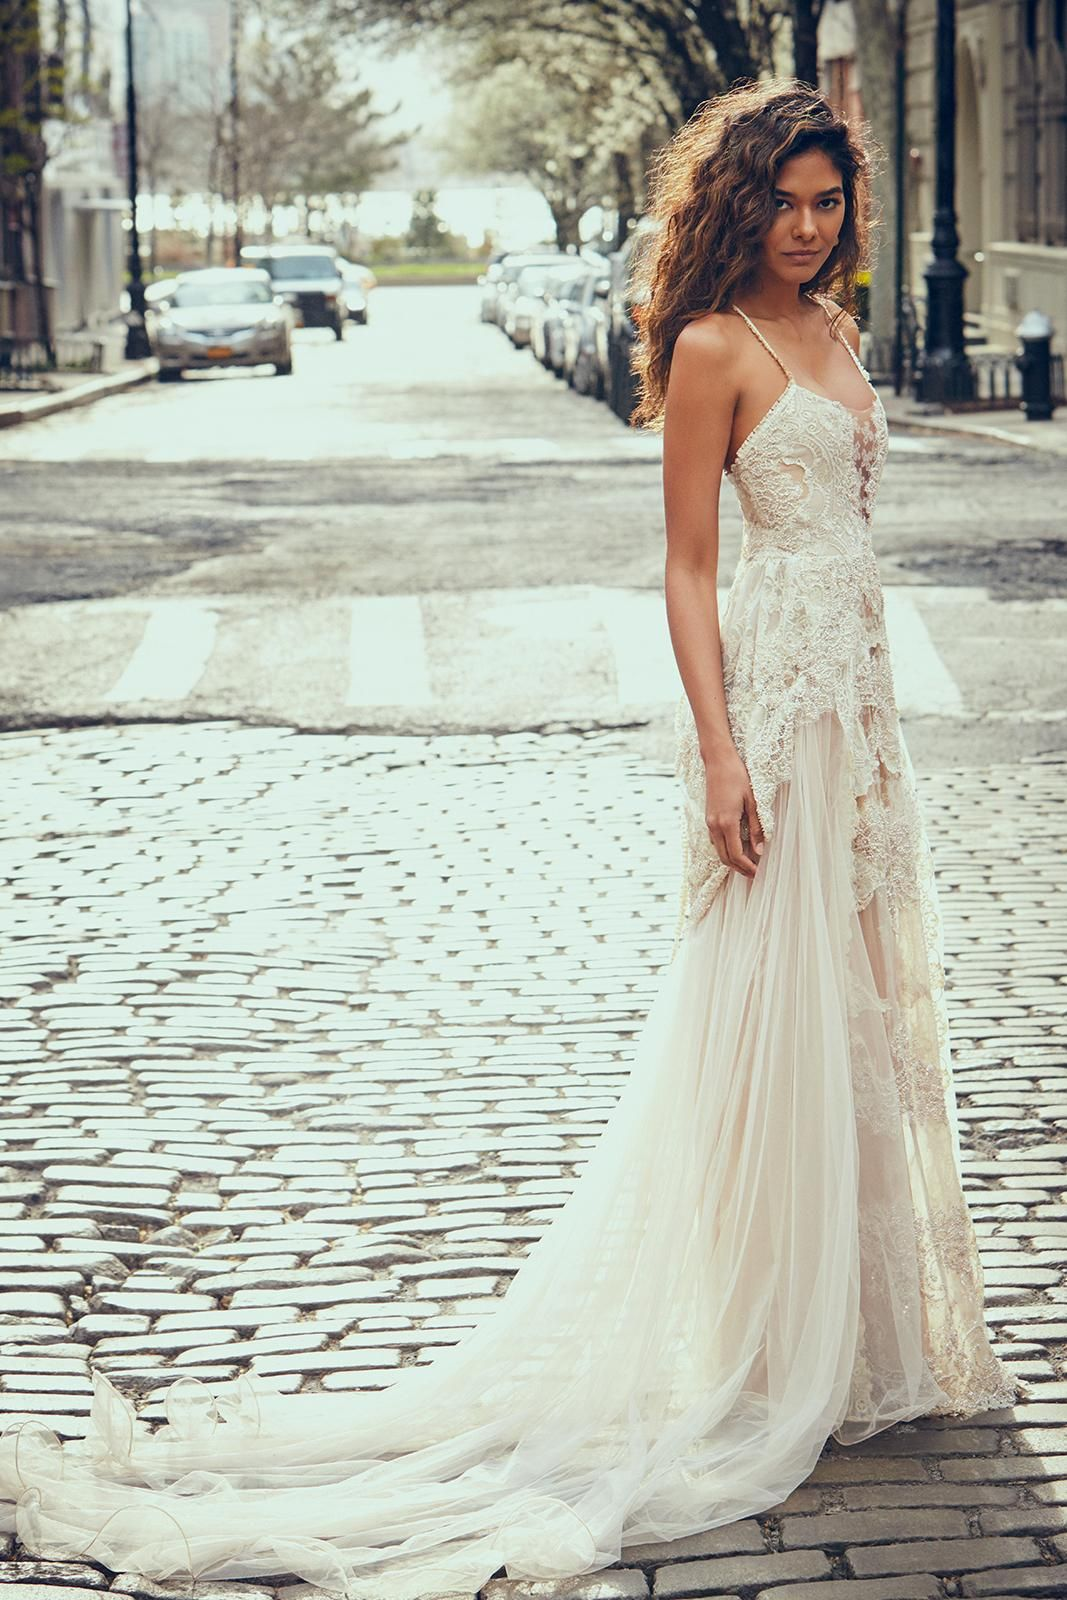 Awesome 79 Beautiful Lace Wedding Dresses Inspiration | GirlYard.com ...